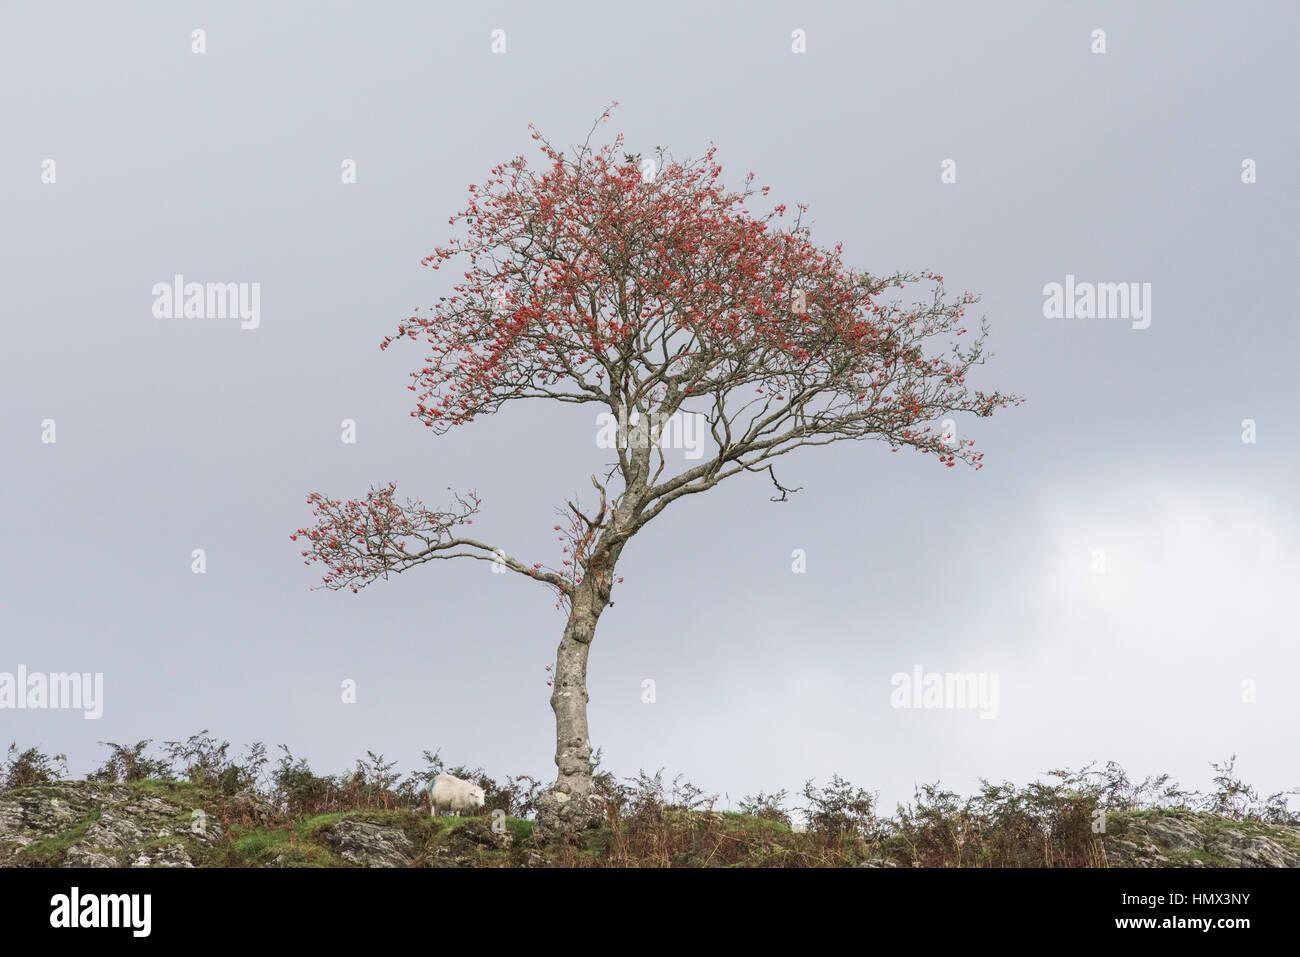 Rowan tree and sheep on Bryn Bras, Ponterwyd, Ceredigion, Wales - Stock Image